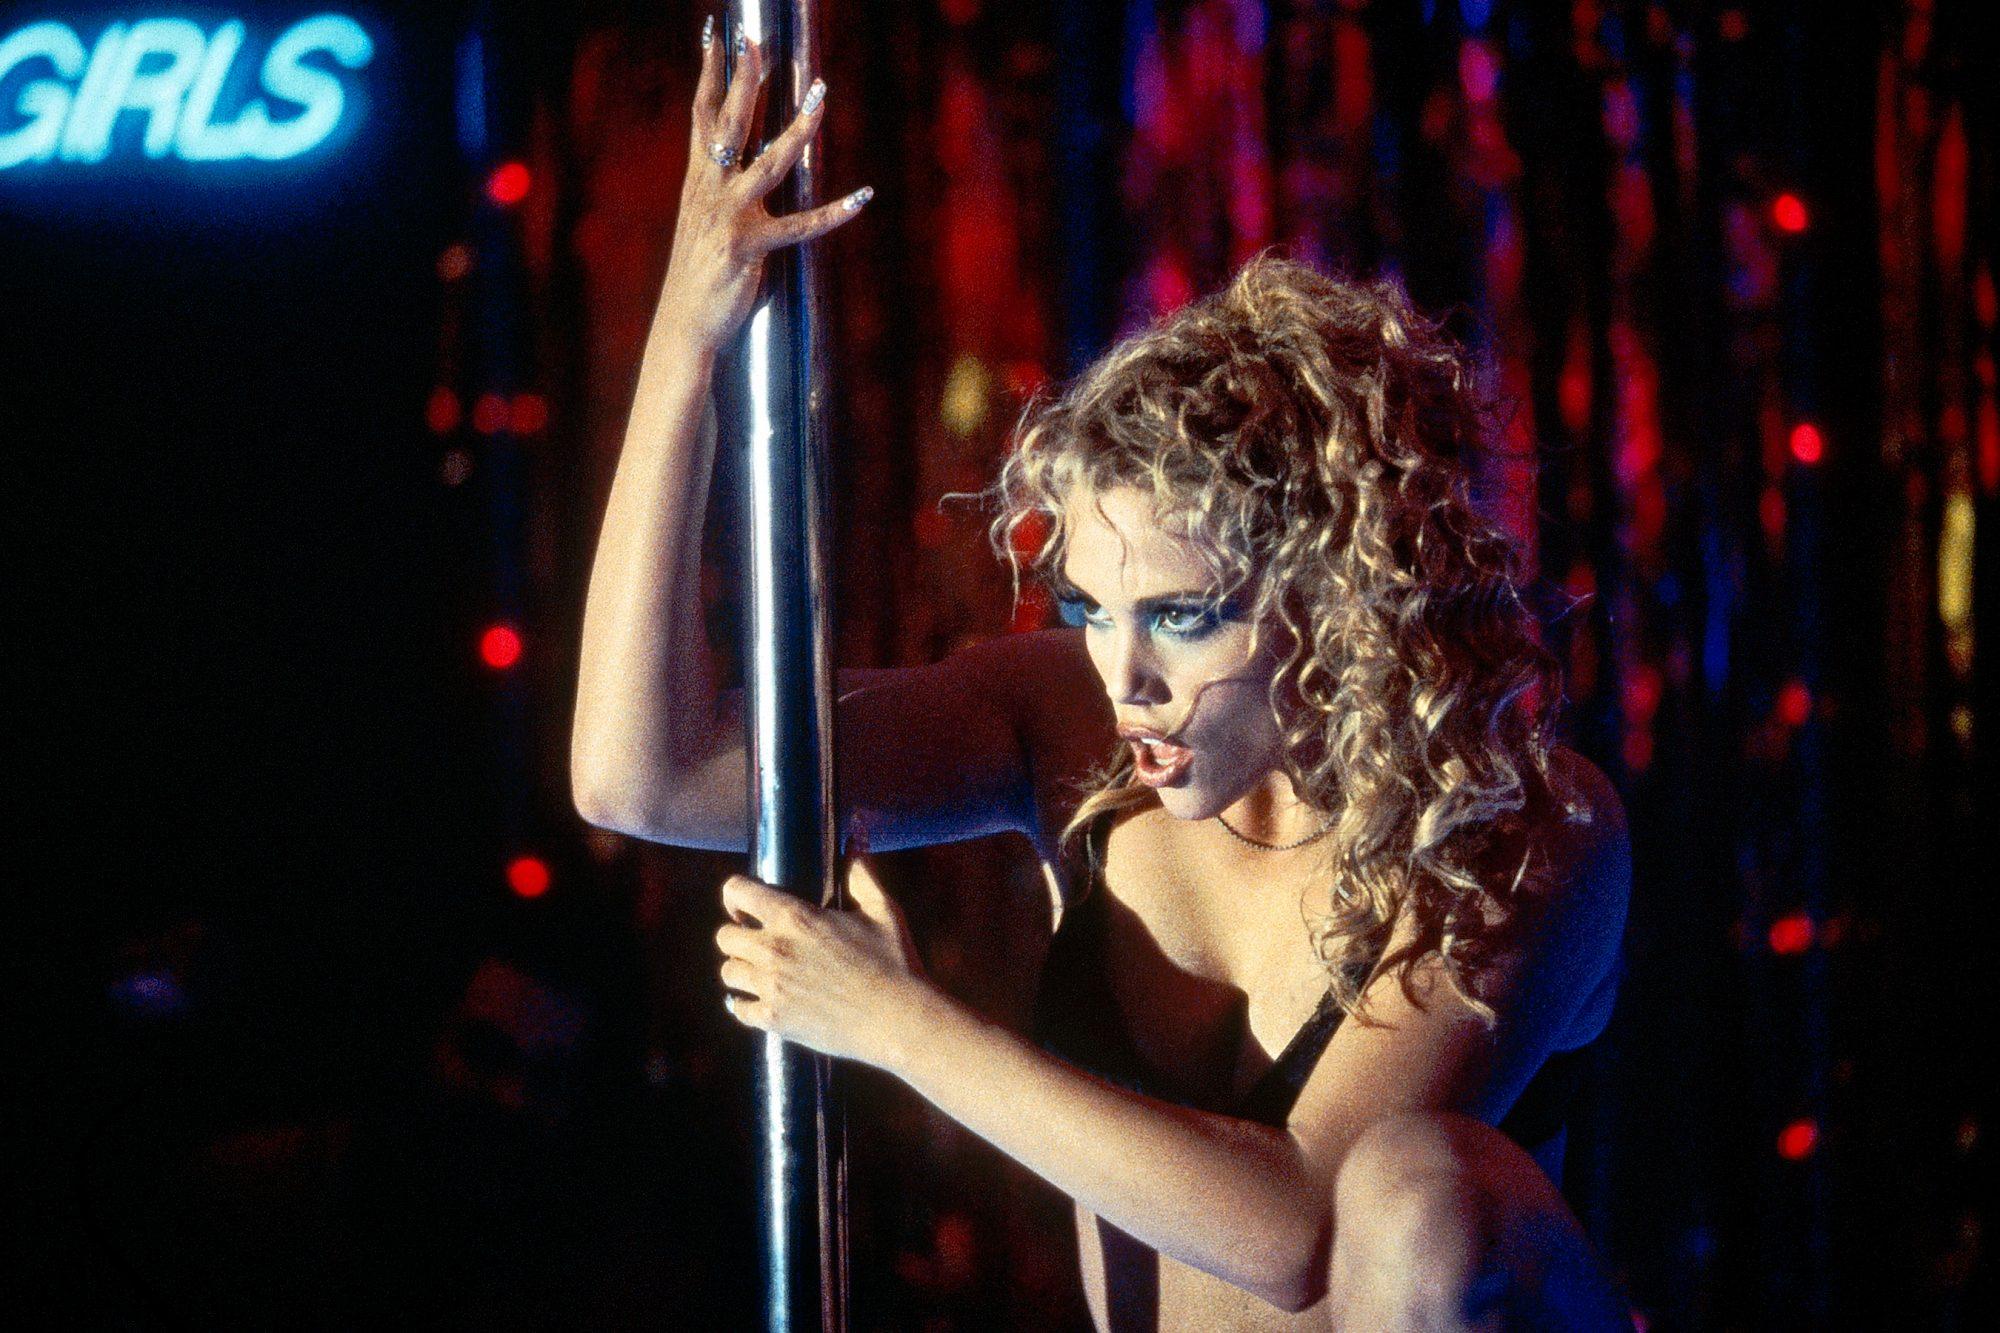 Showgirls (1995)Elizabeth Berkley